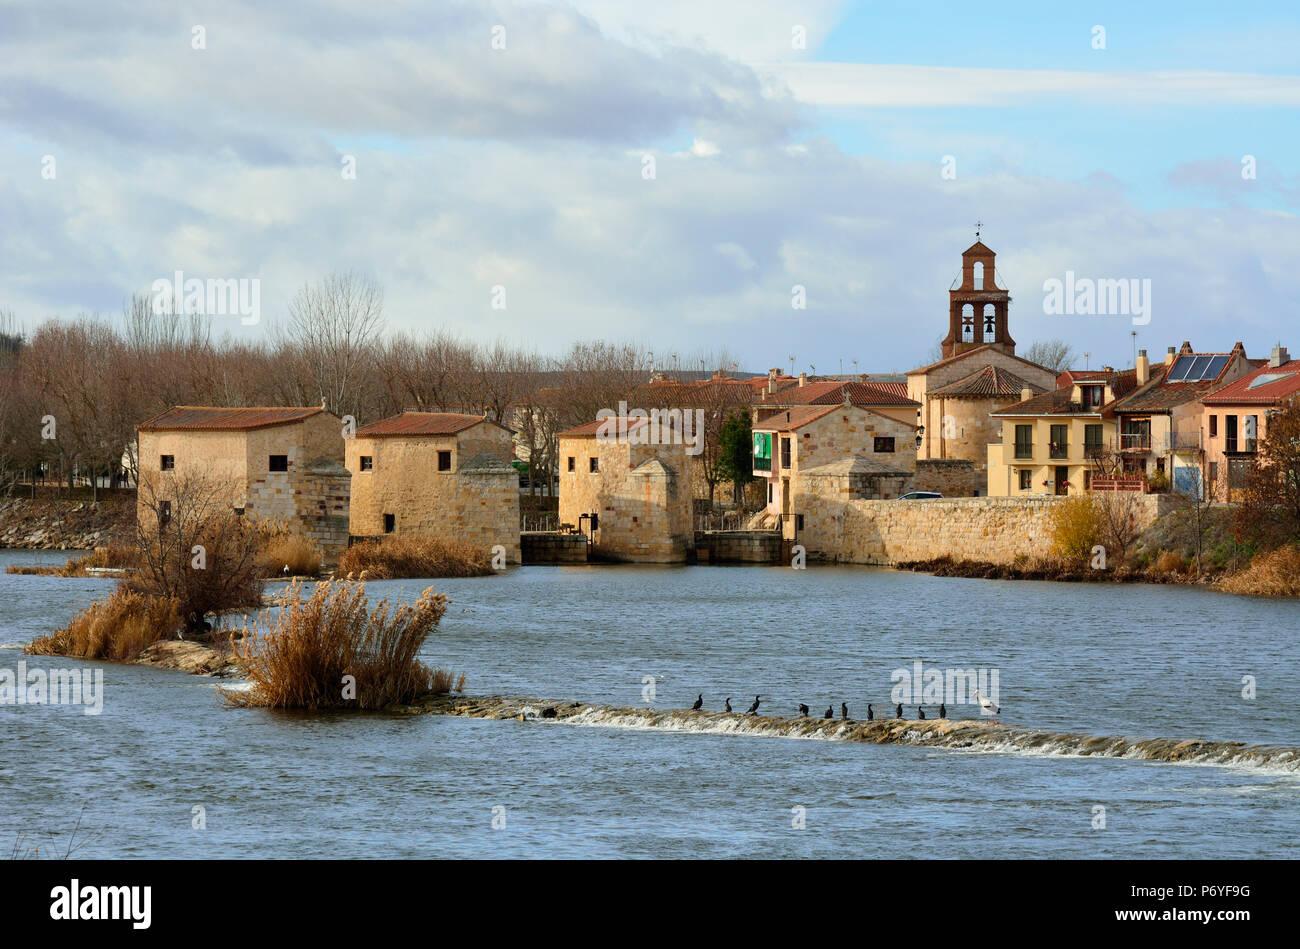 The watermills of Zamora along the Douro river. Castilla y Leon, Spain - Stock Image